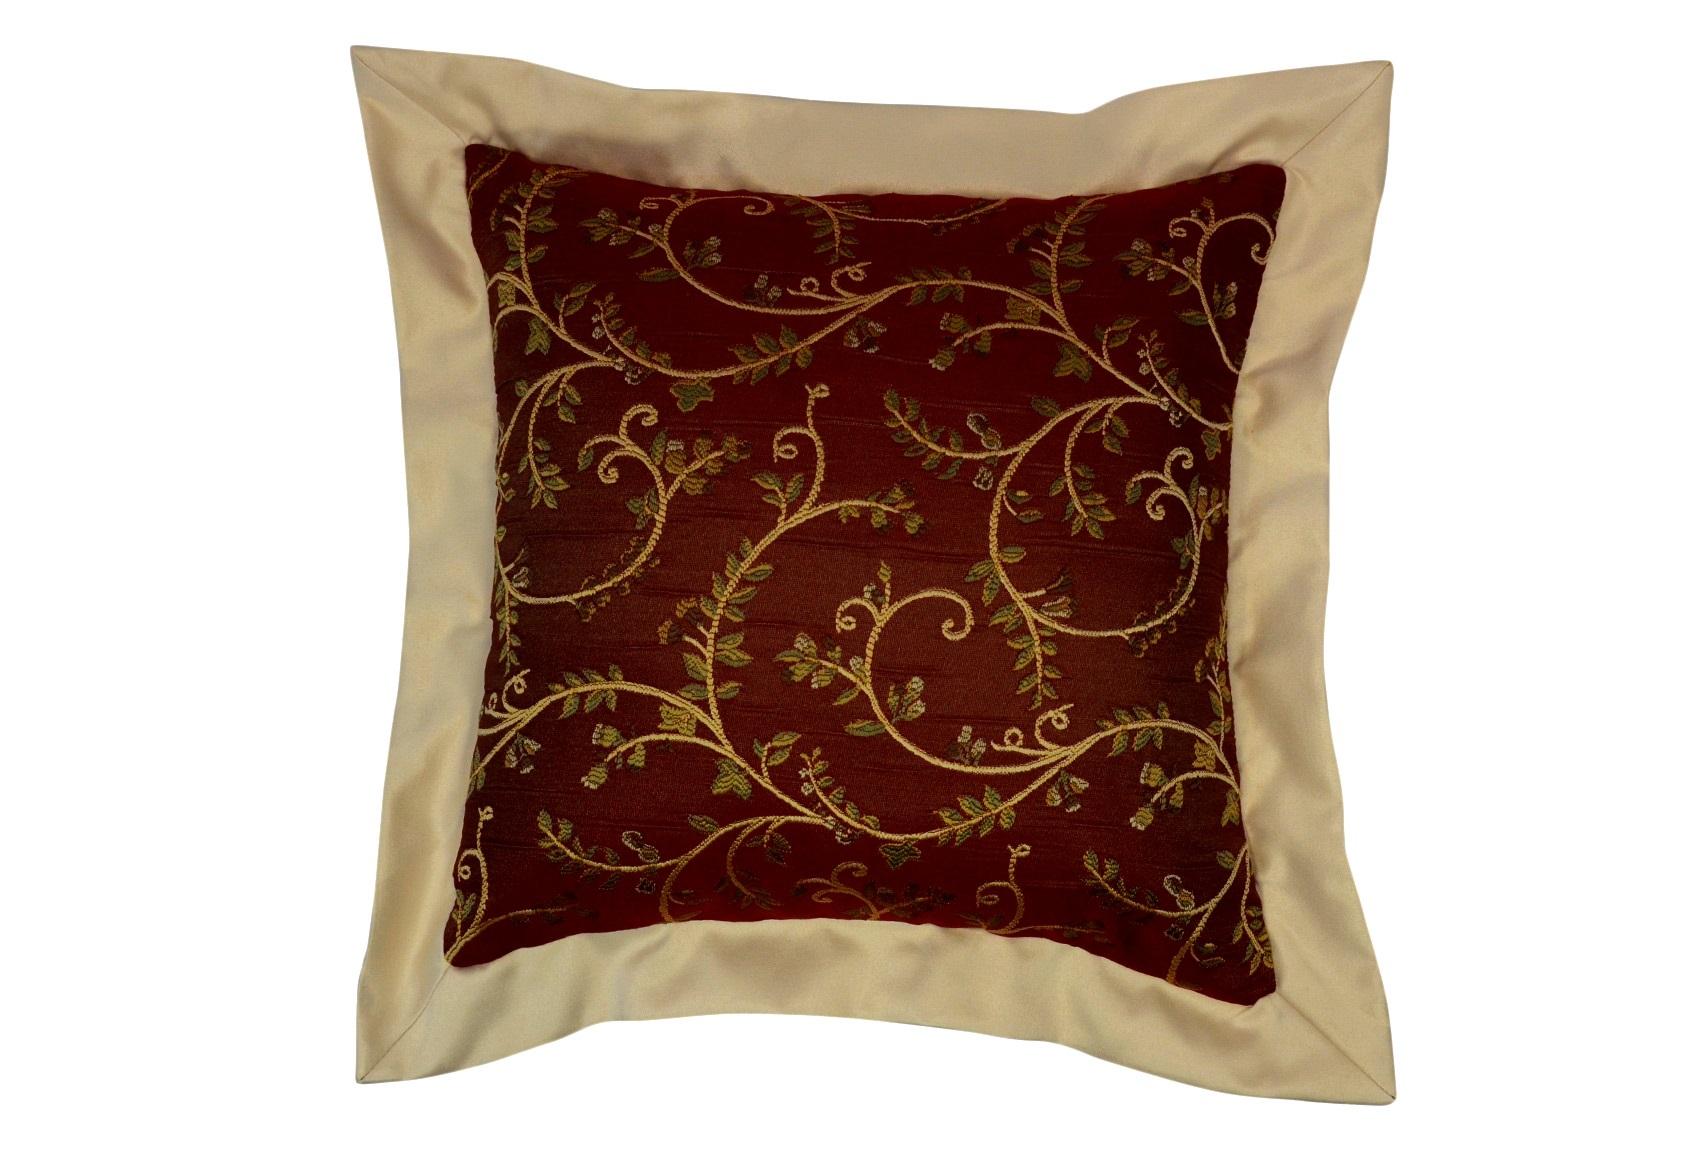 Подушка Arabelle BordoКвадратные подушки<br>Декоративная  подушка .Чехол съемный.<br><br>Material: Вискоза<br>Length см: None<br>Width см: 50<br>Depth см: 15<br>Height см: 50